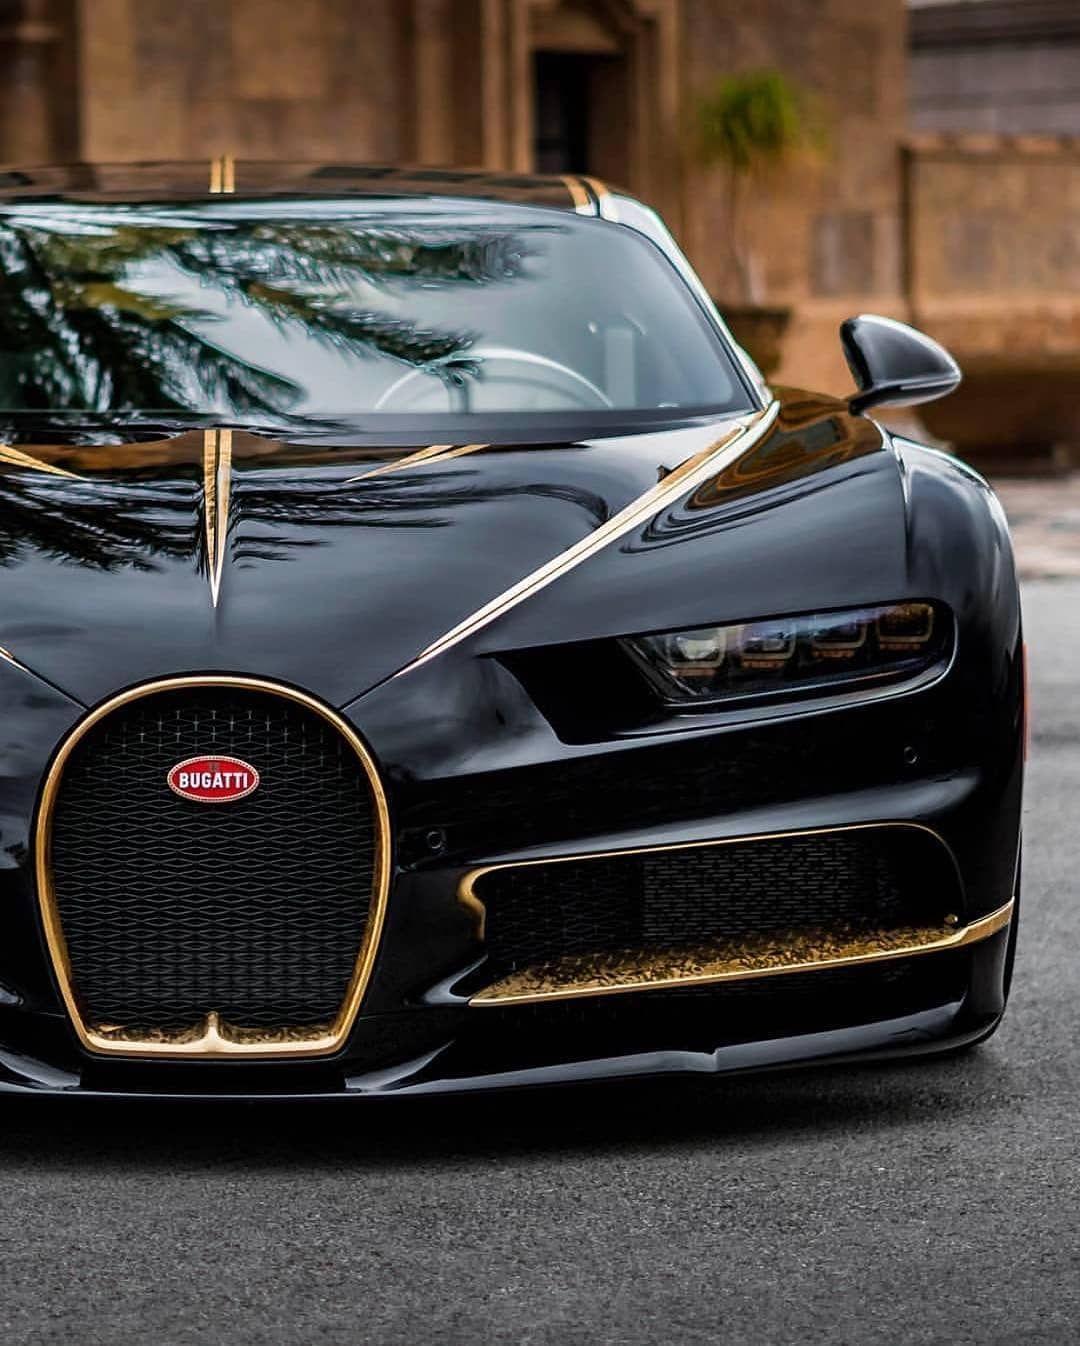 Black Bugatti: Black & Gold Chiron! #Bugatti #Chiron #Black #Gold